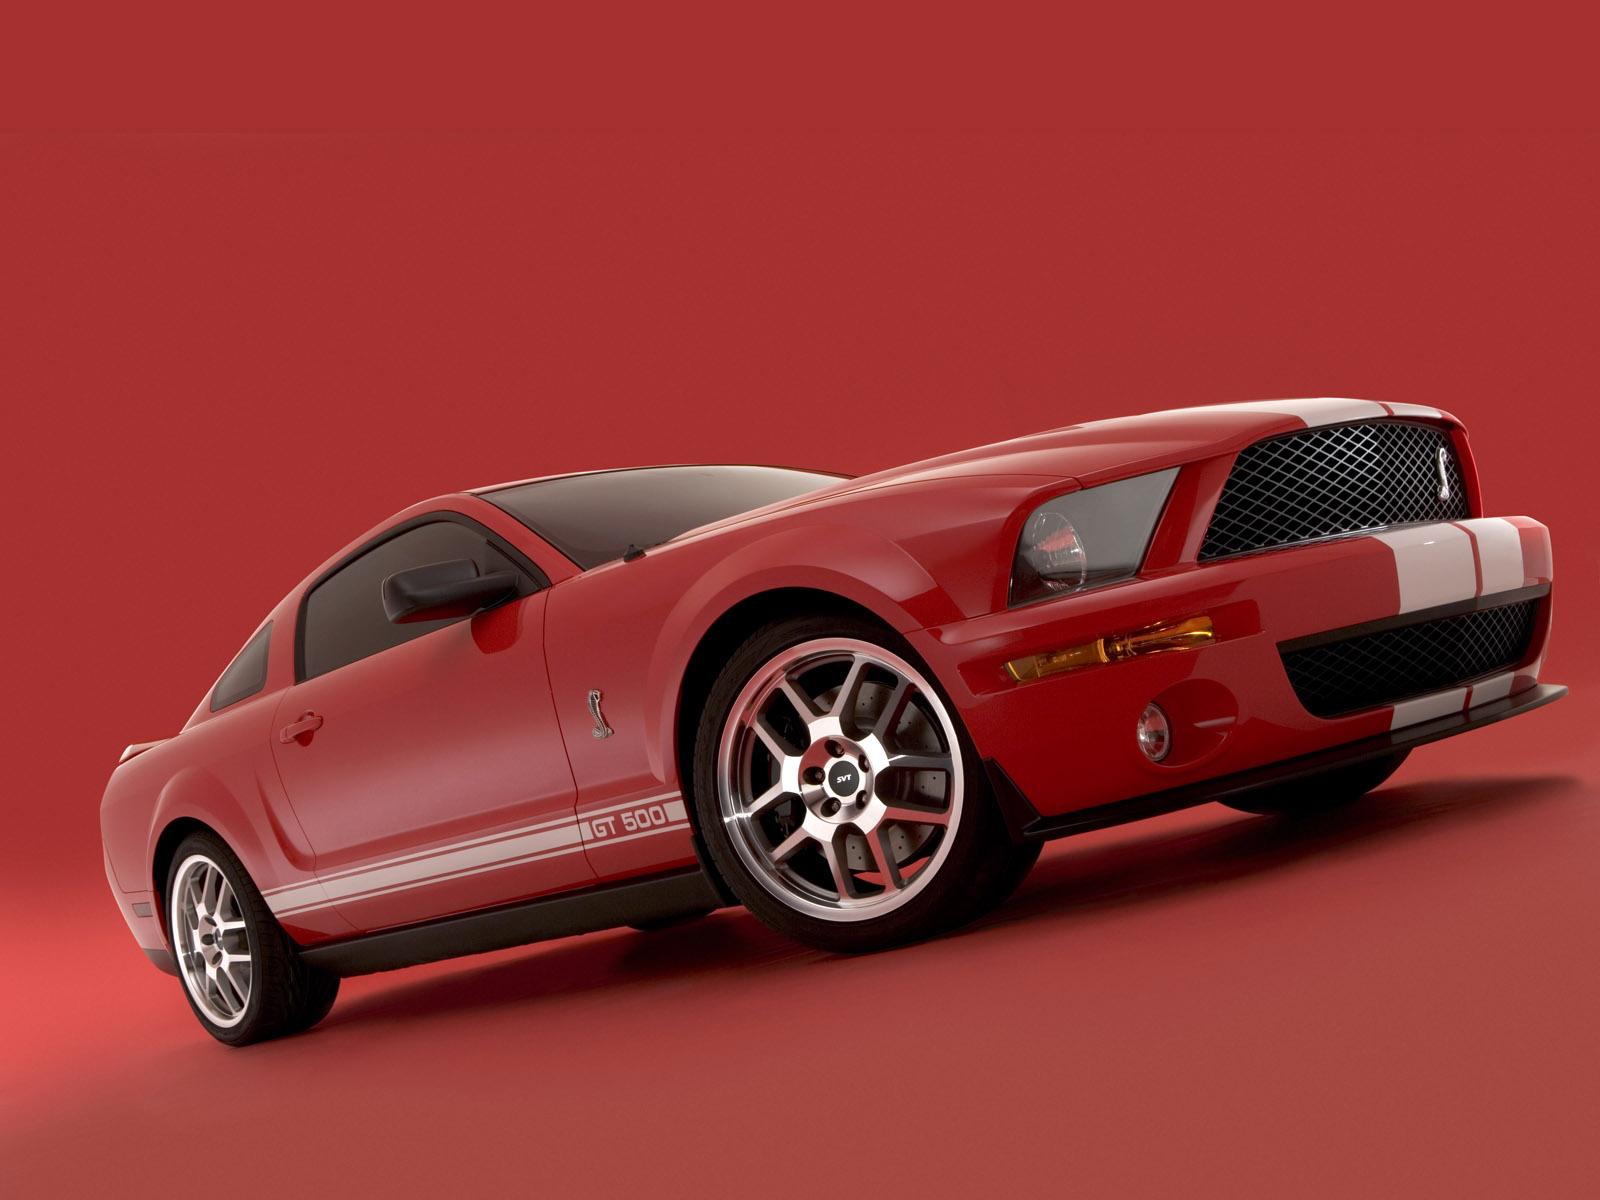 Ford Mustang Cobra 2005 2005 SHELBY COBRA GT50...